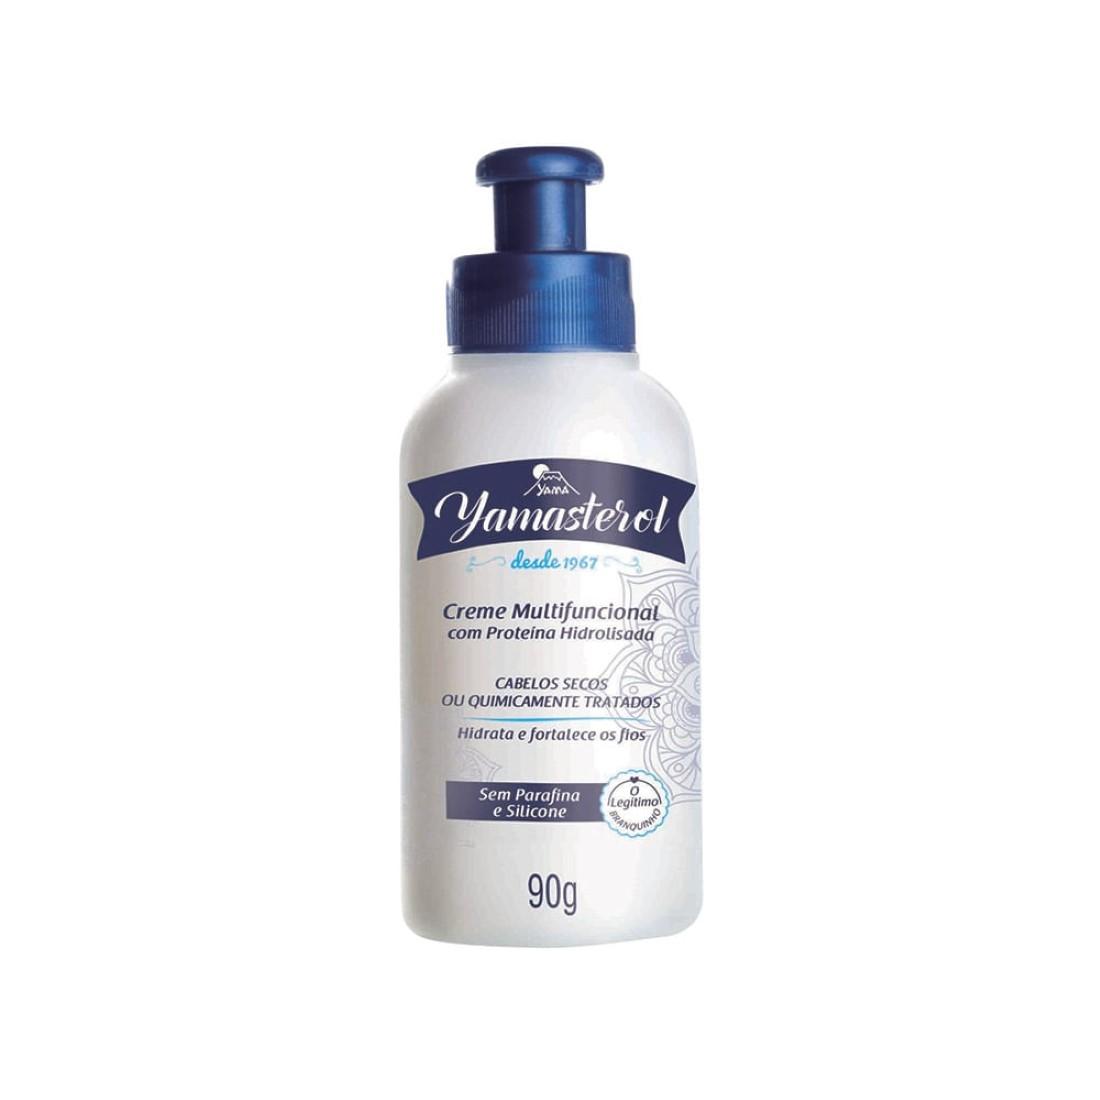 Yamasterol Creme Multifuncional com Proteína Hidrolisada 90g - Yamá